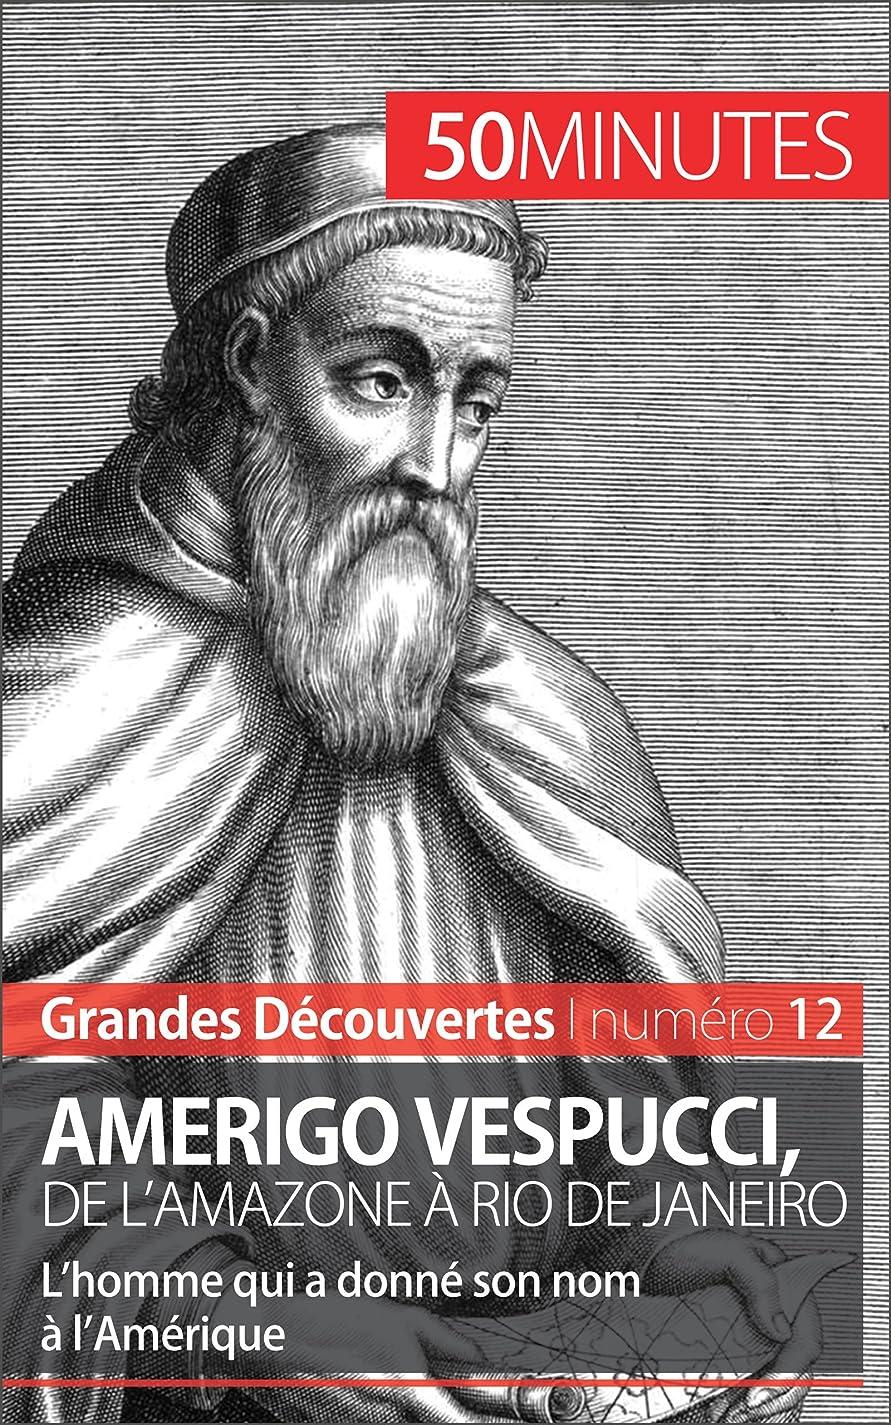 過ち回答塩辛いAmerigo Vespucci, de l'Amazone à Rio de Janeiro: L'homme qui a donné son nom à l'Amérique (Grandes Découvertes t. 12) (French Edition)